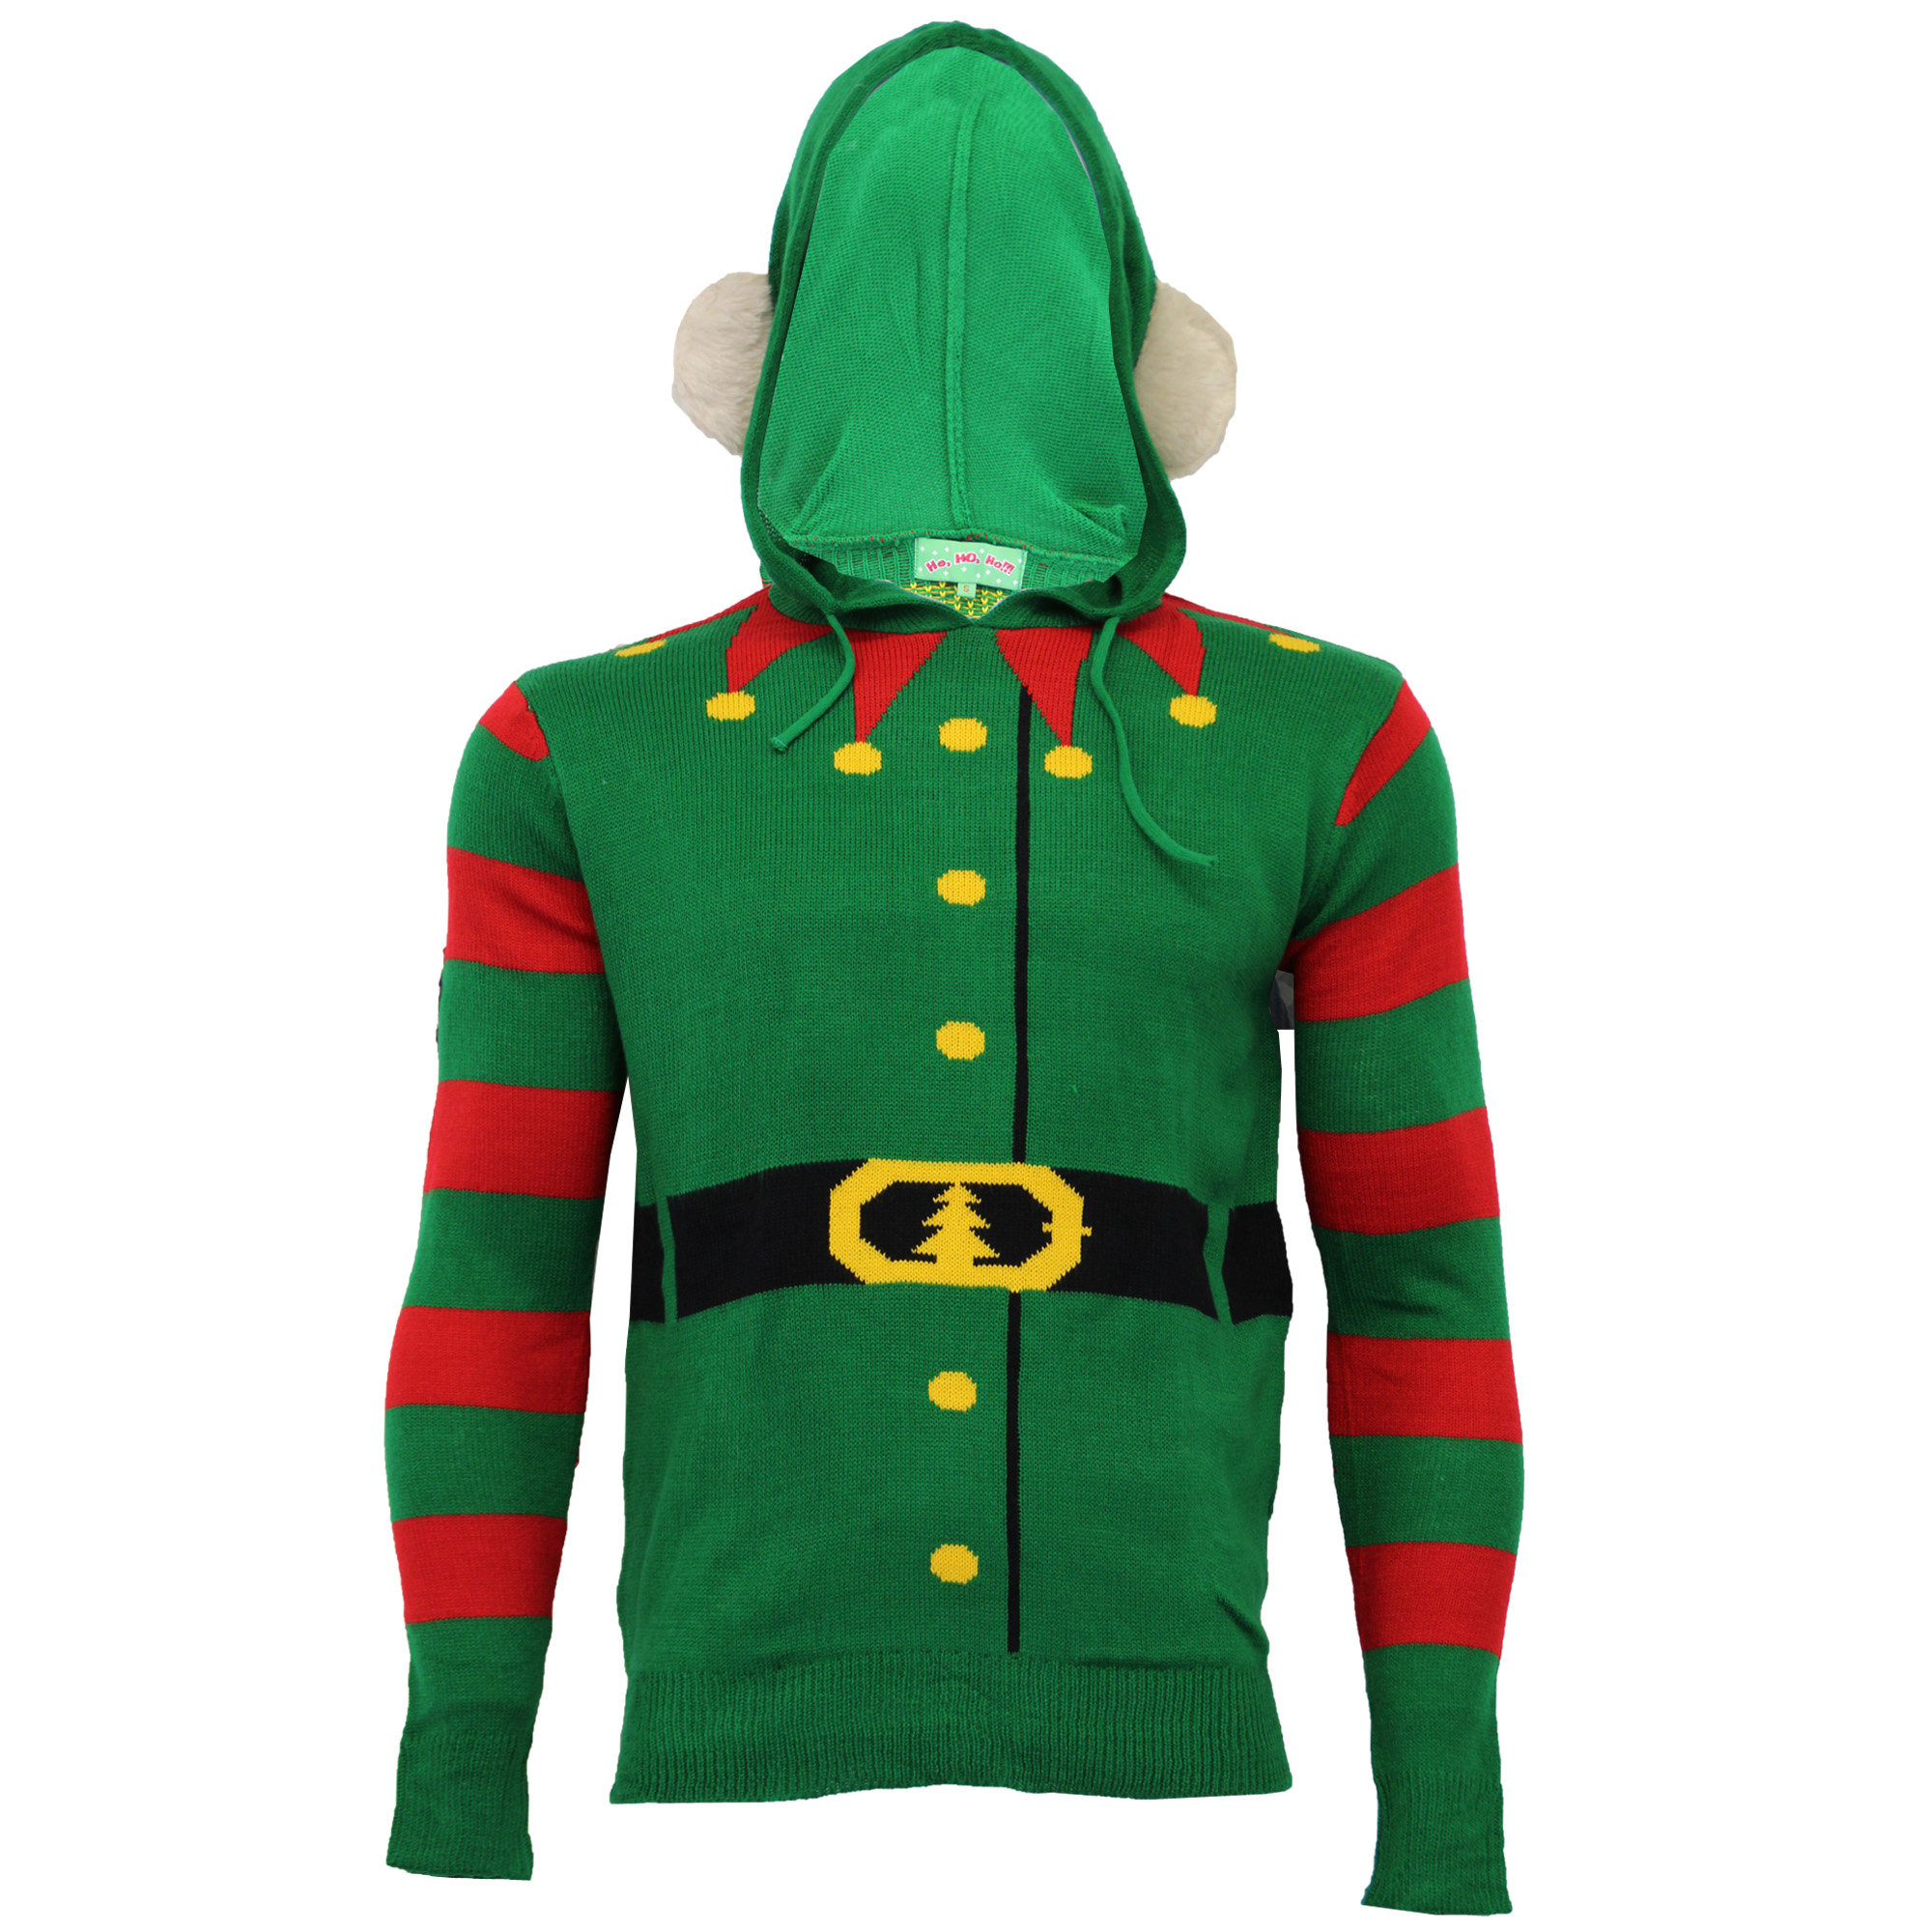 Mens Novelty Funny Knitted Christmas Jumper Xmas Overhead Hoody Bells Buddy Elf